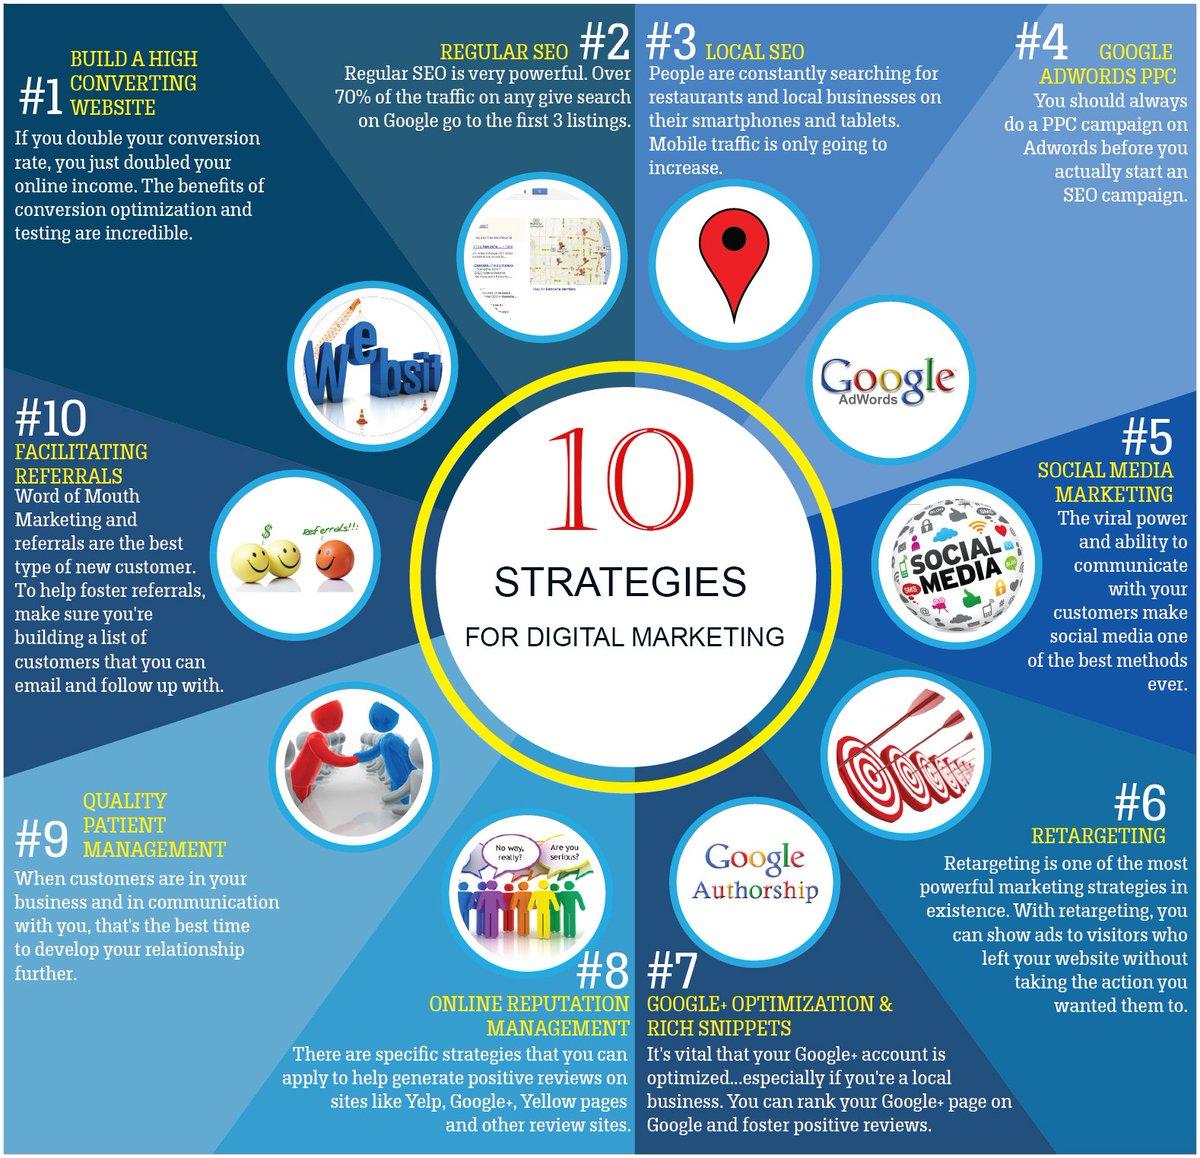 10 Strategies For Digital Marketing #DigitalMarketing #SEO #SEM #SMO #businessgrowth #strategy #GrowthHacking<br>http://pic.twitter.com/pFHa5ftqes